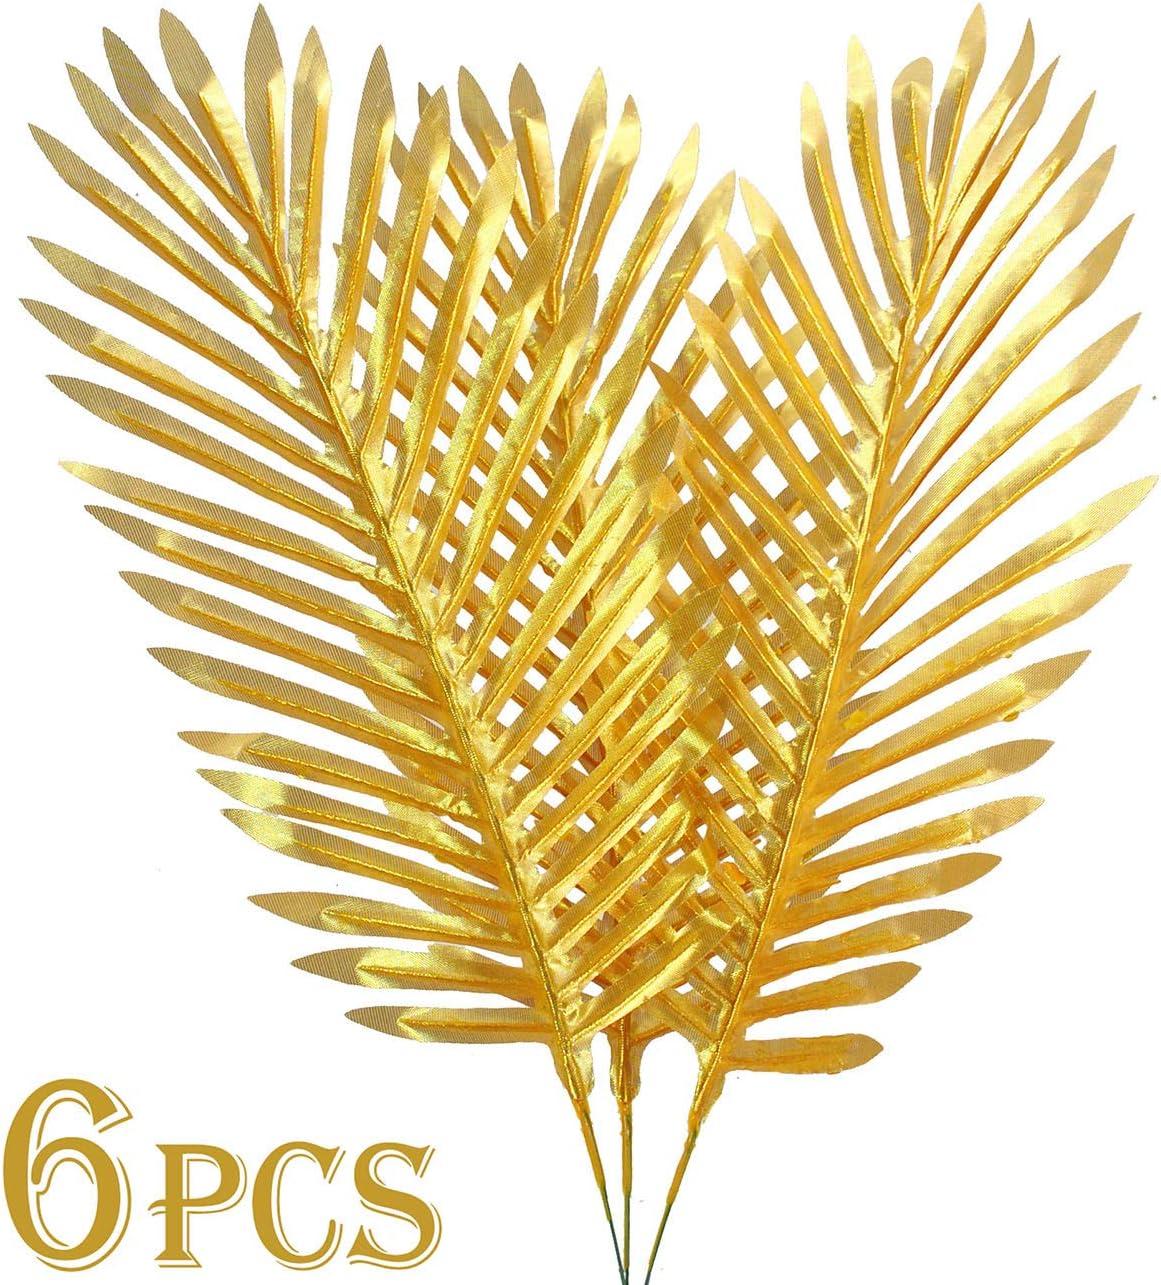 "6PCS Artificial Palm Plants Leaves Imitation Leaf Artificial Plants Faux Fake Tropical Large for Home Arrangement Jungle Birthday Party Wedding Decoration Supplies (27"" Golden Palm Leaves)"